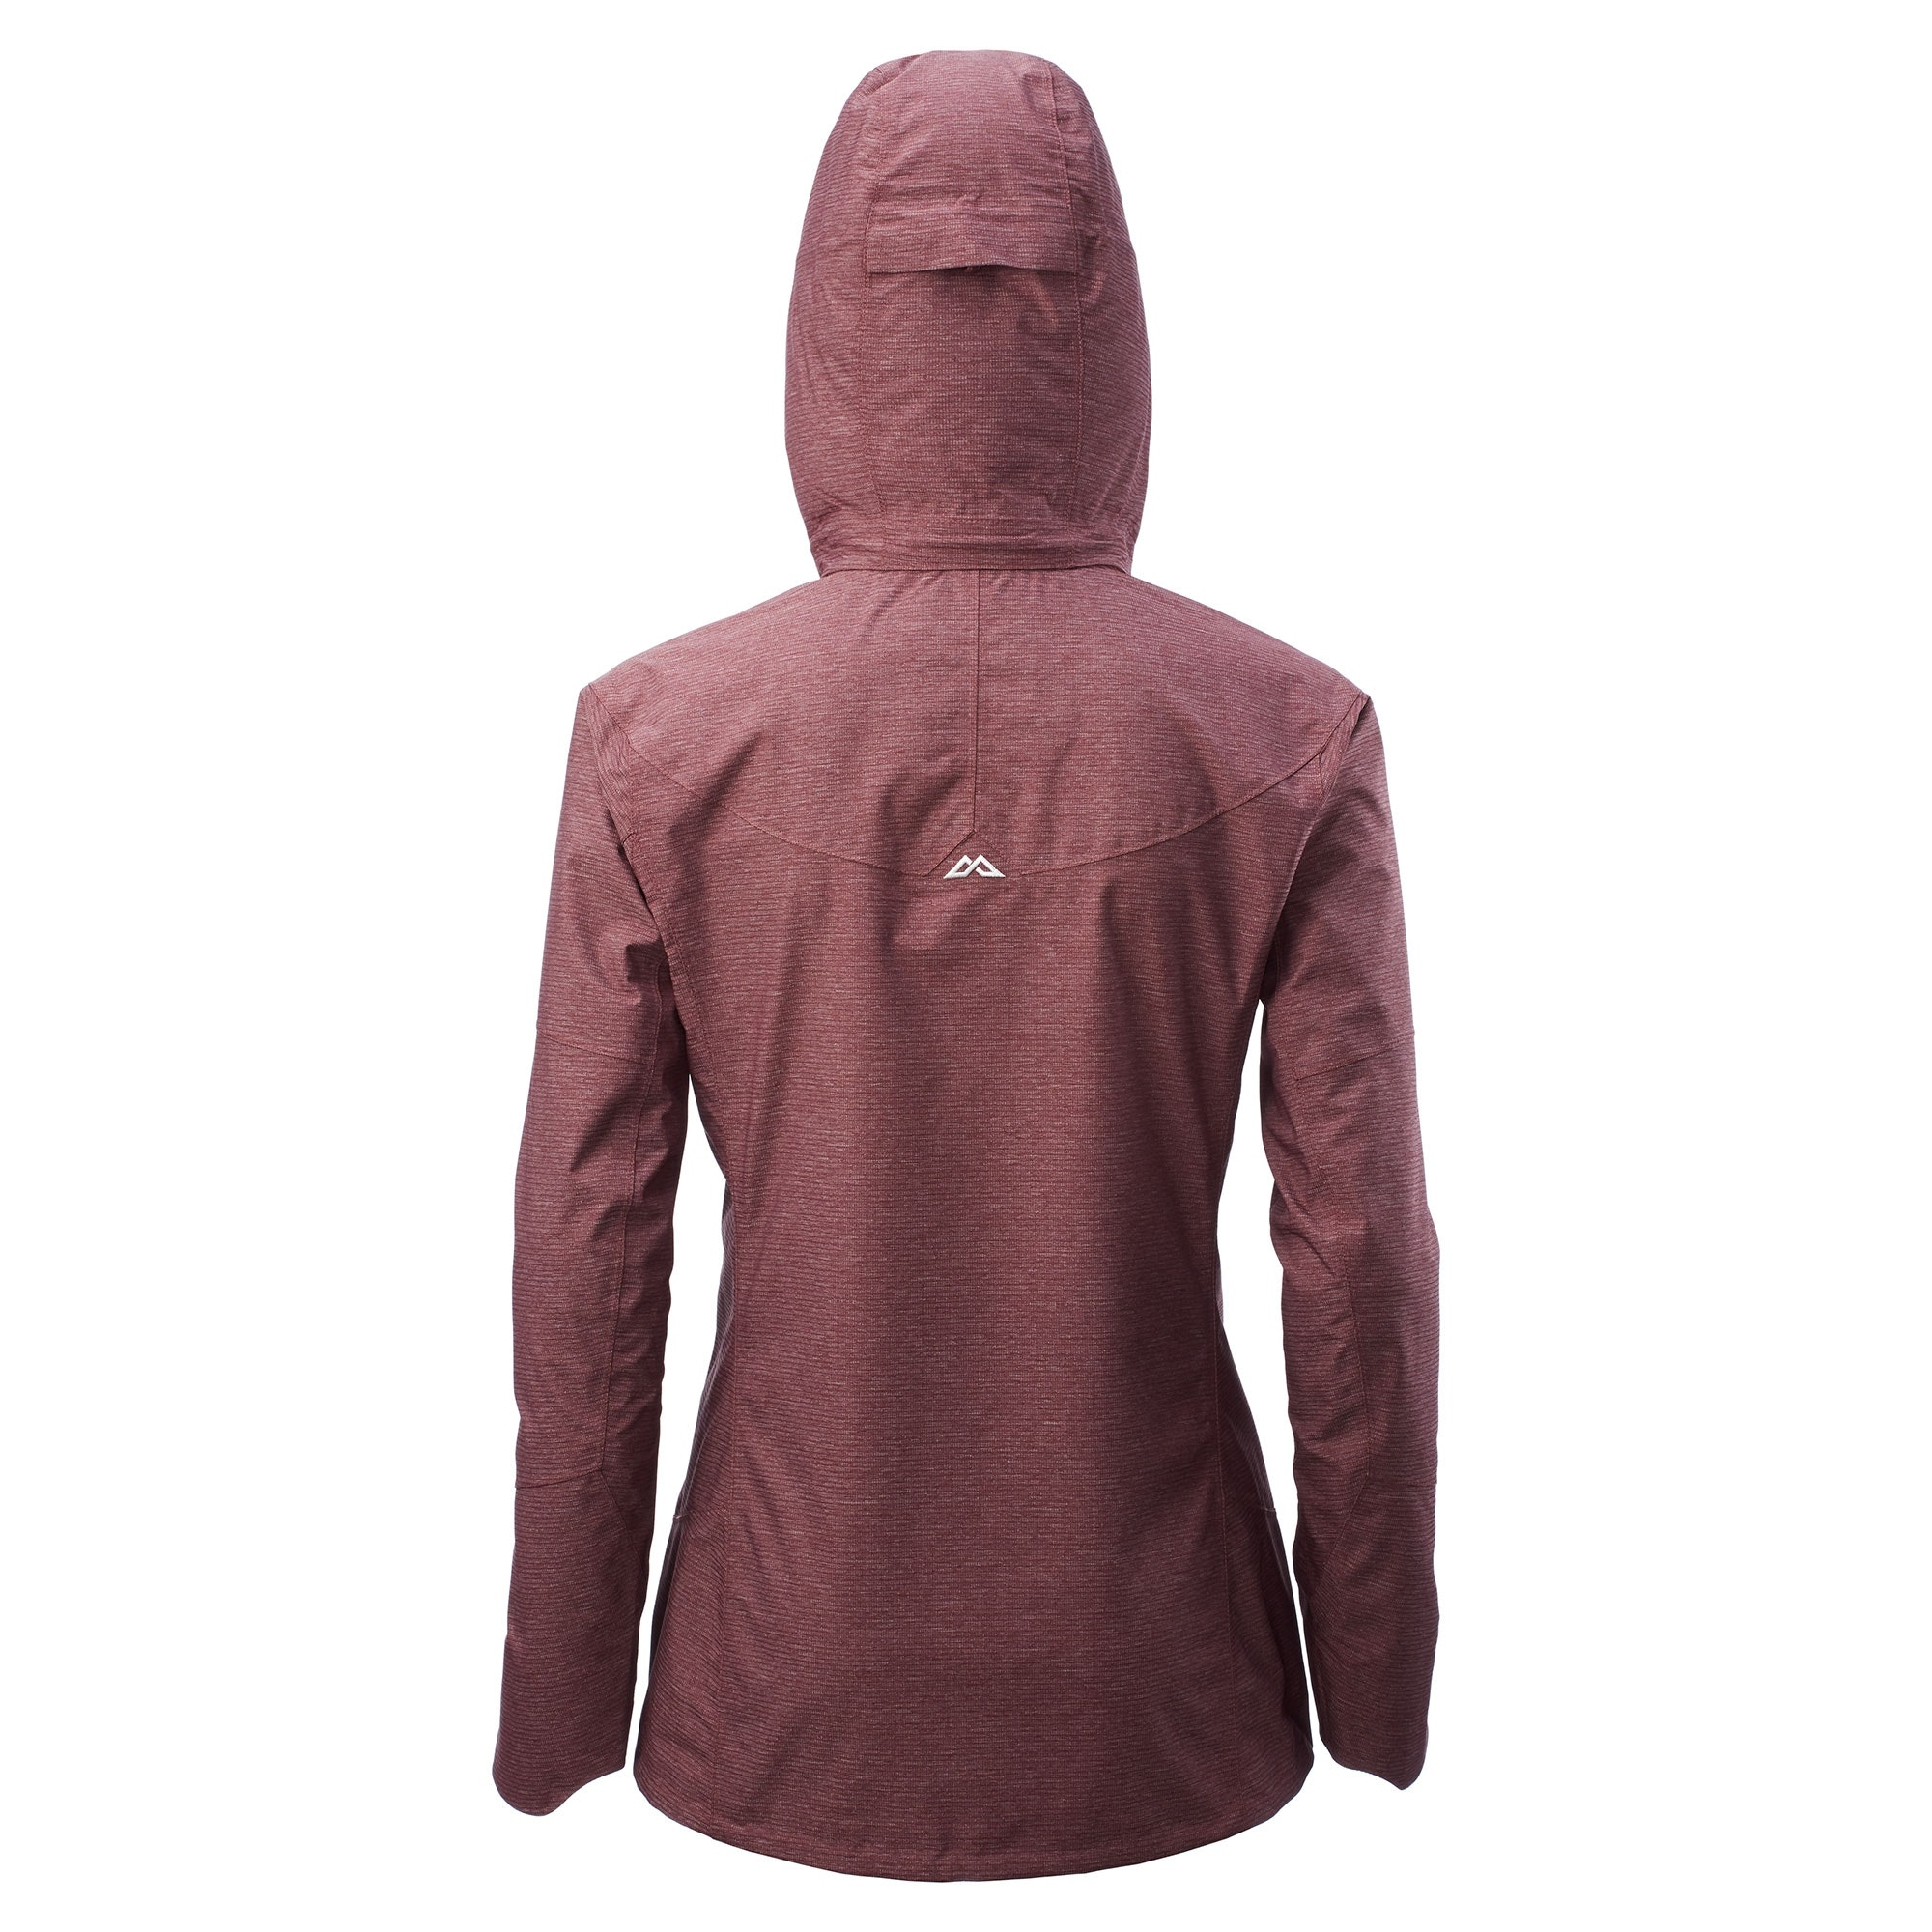 NEW-Kathmandu-Lawrence-Women-039-s-ngx-Windproof-Waterproof-Outdoor-Rain-Jacket-v2 thumbnail 20